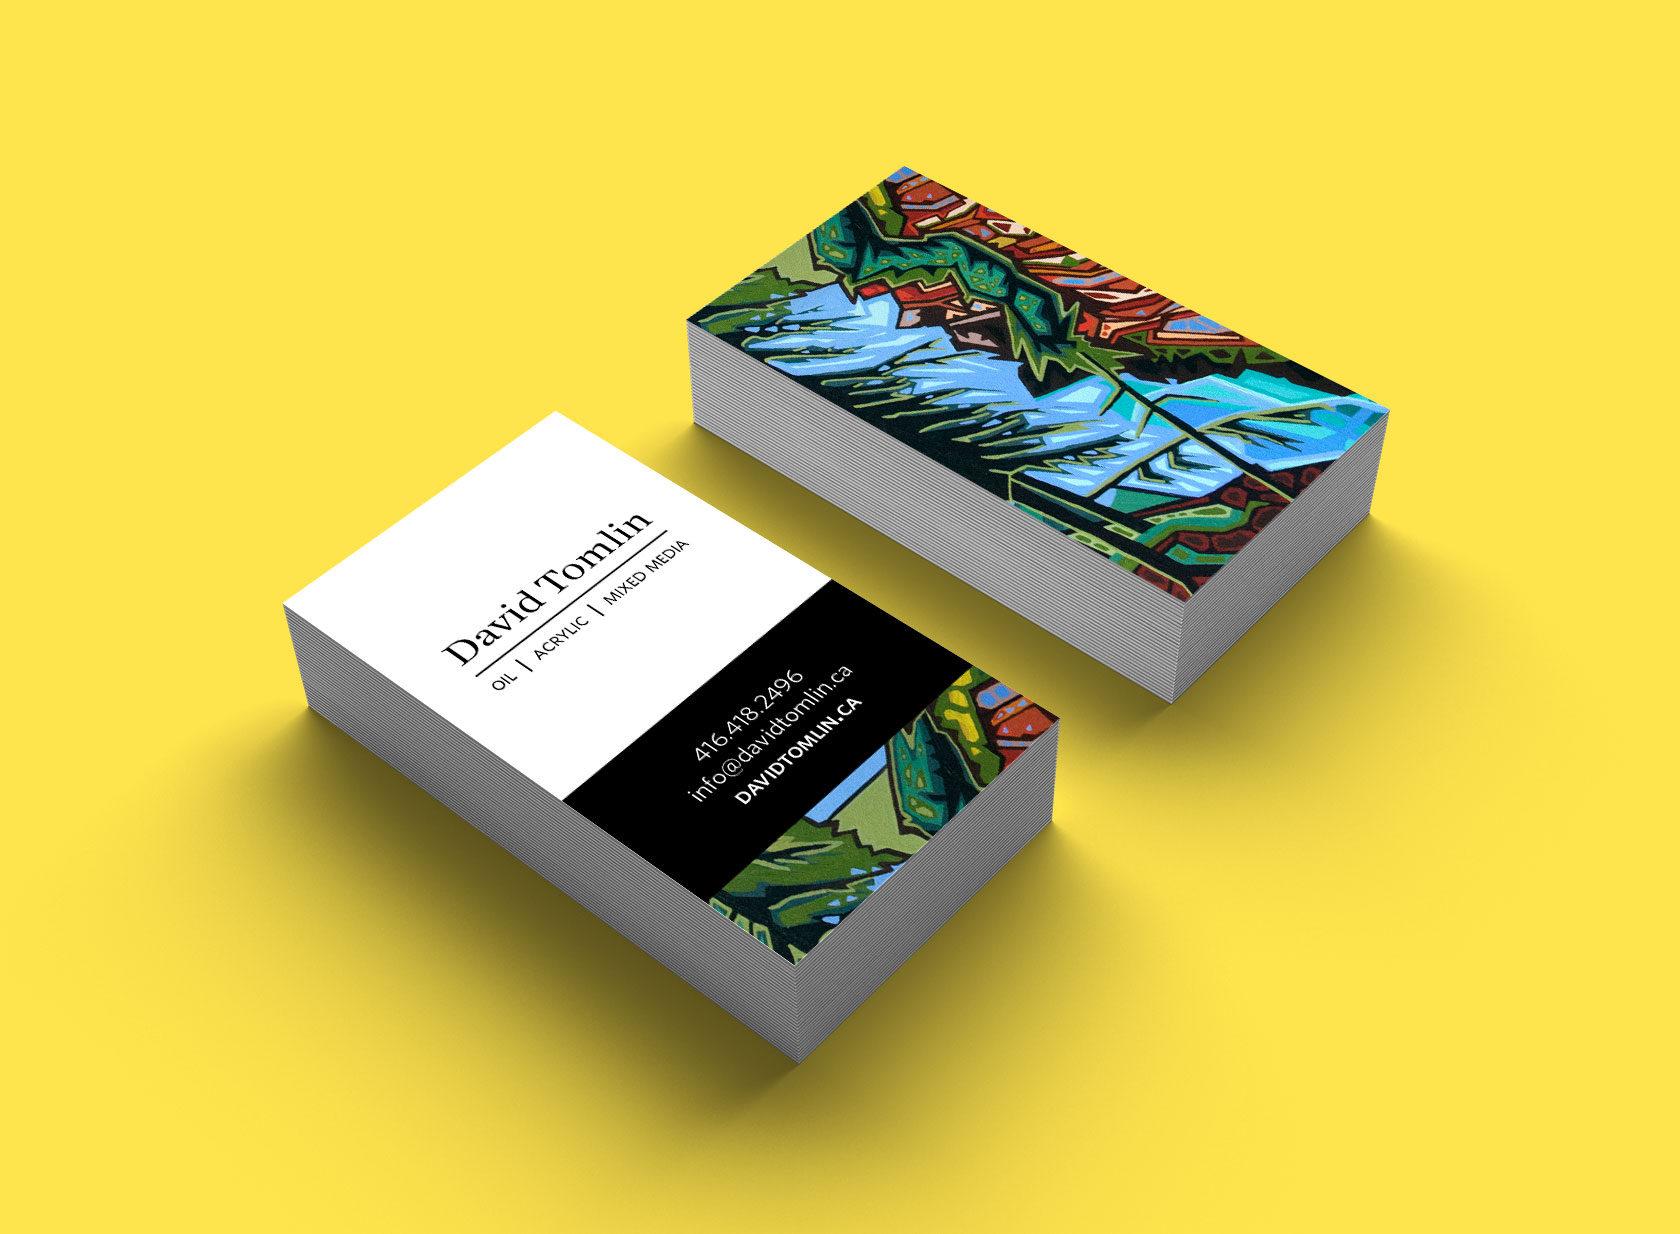 David Tomlin Business Card Design by Furia